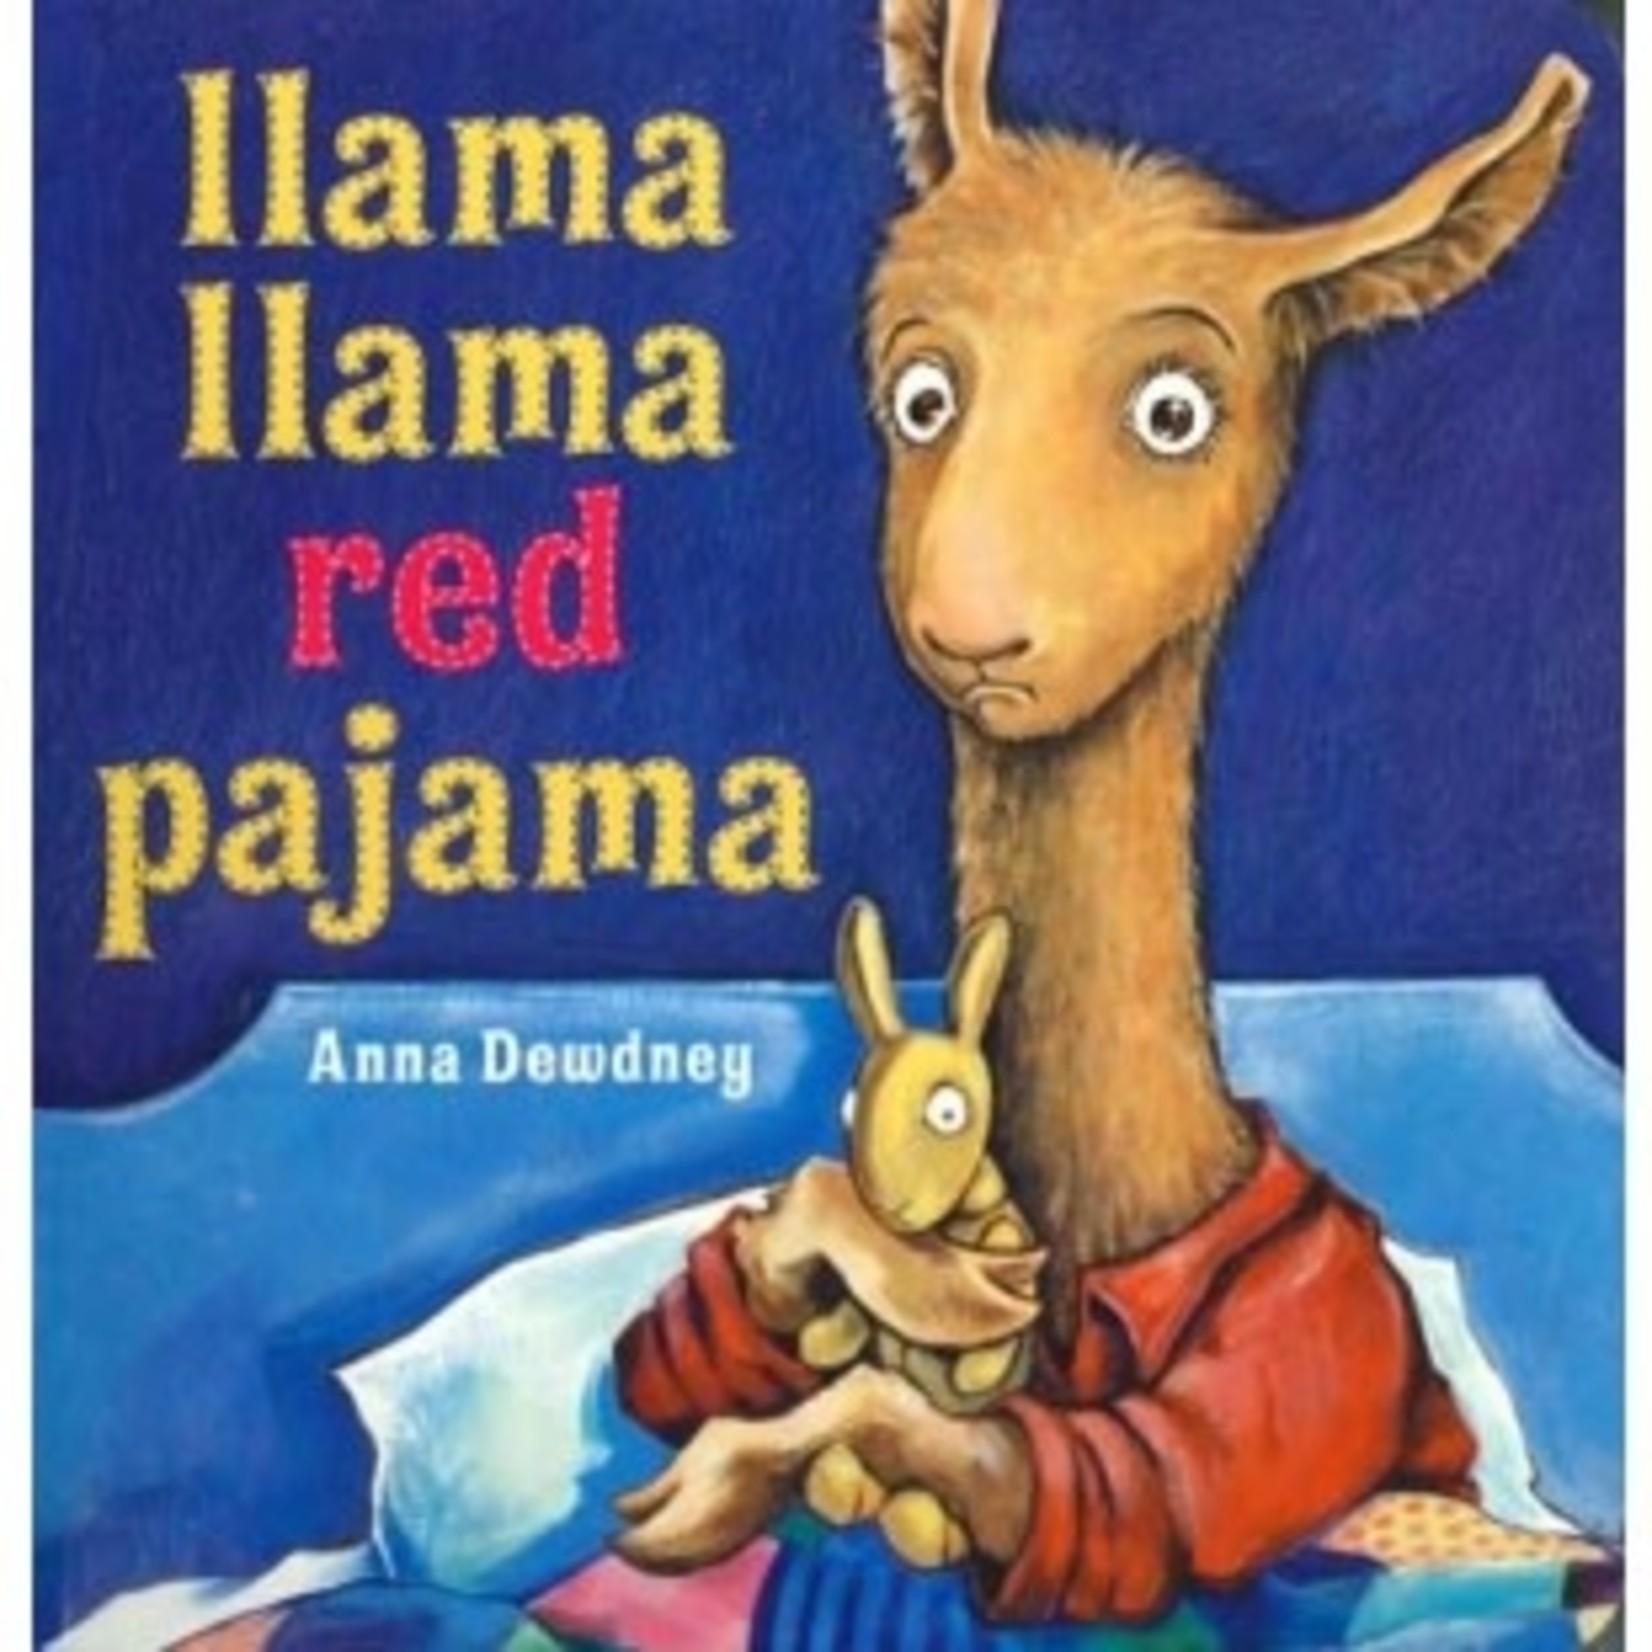 Skandisk, Inc. Book: Llama Llma Red Pajama